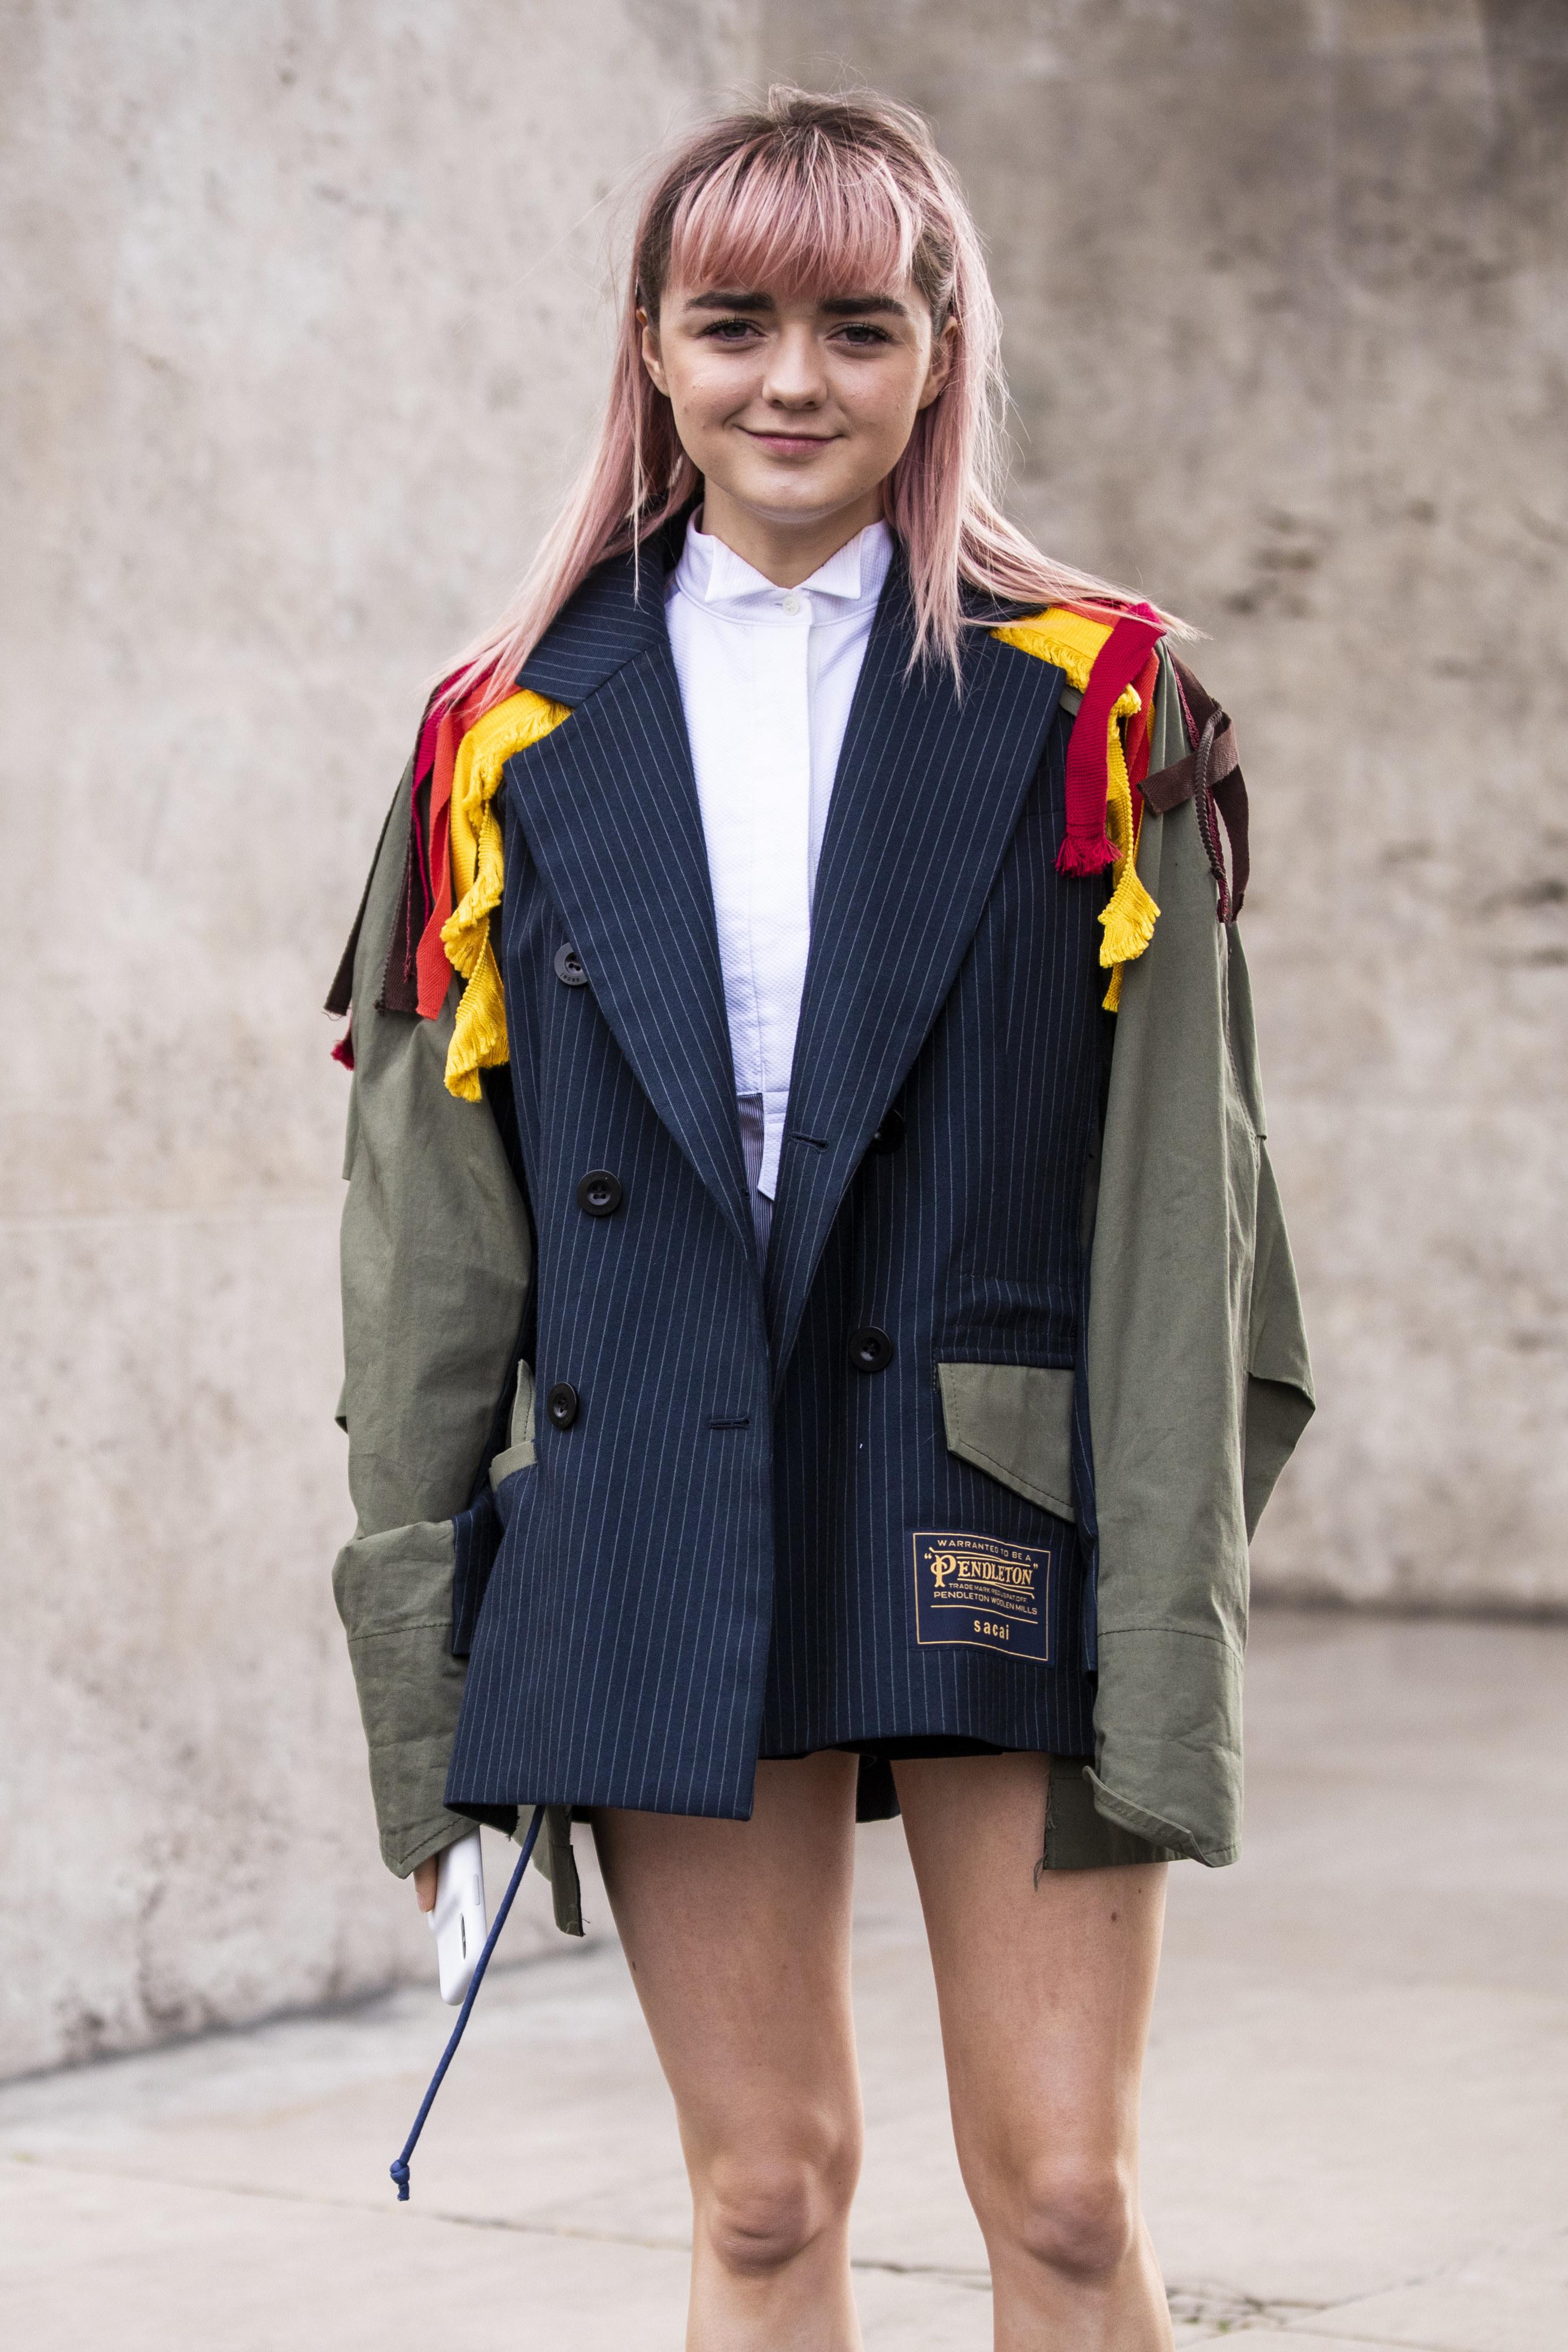 Maisie Williams is seen outside Sacai on Day 8 Paris Fashion Week Autumn/Winter 2019/20 on March 4, 2019